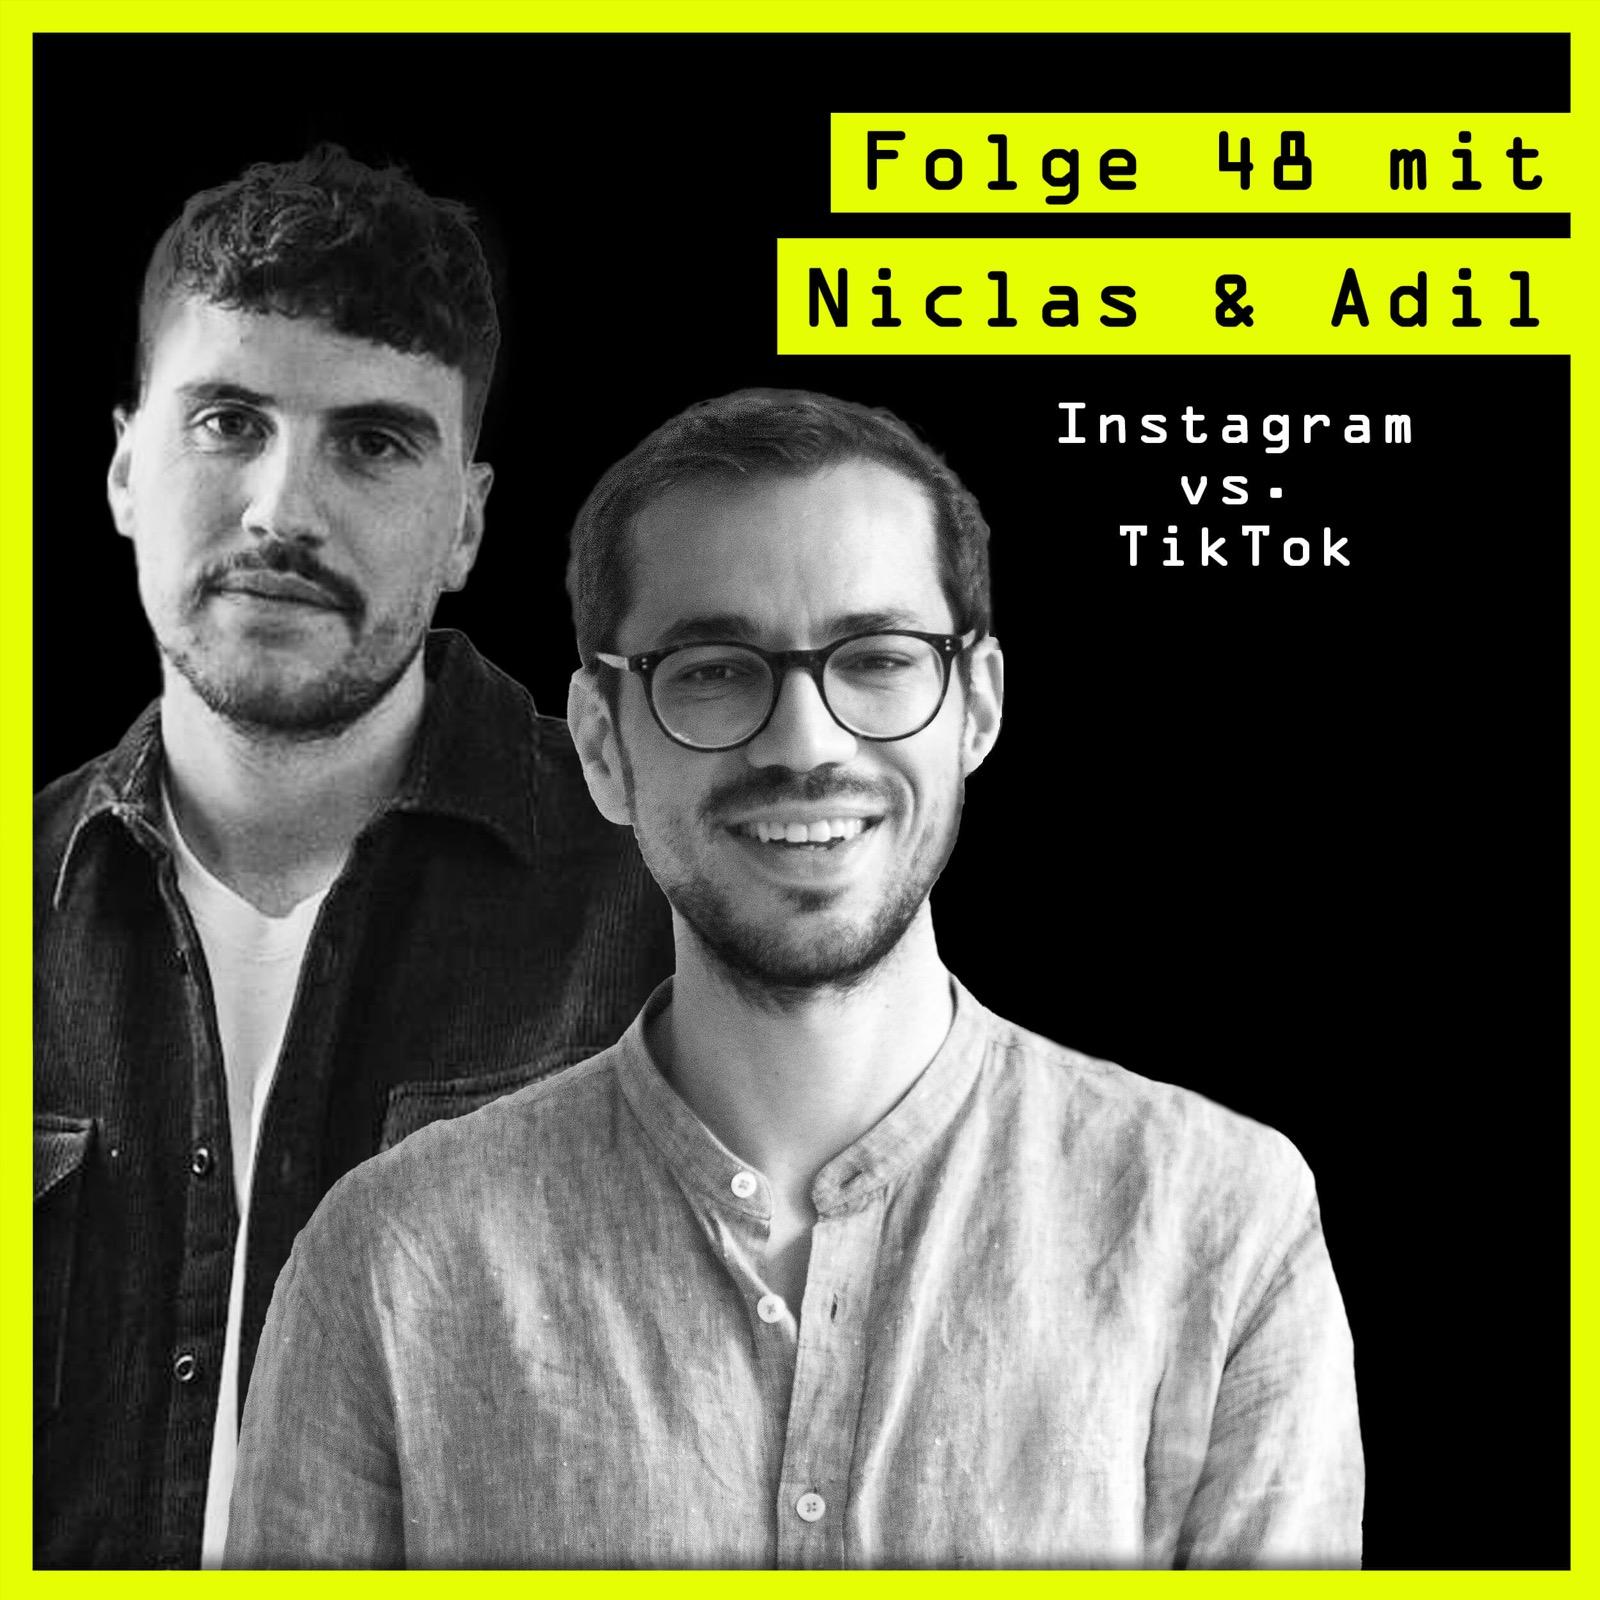 #48 mit Niclas Kroll (CEO, hypelab GbR) und Adil Sbai (CEO, weCreate): über Instagram vs. TikTok